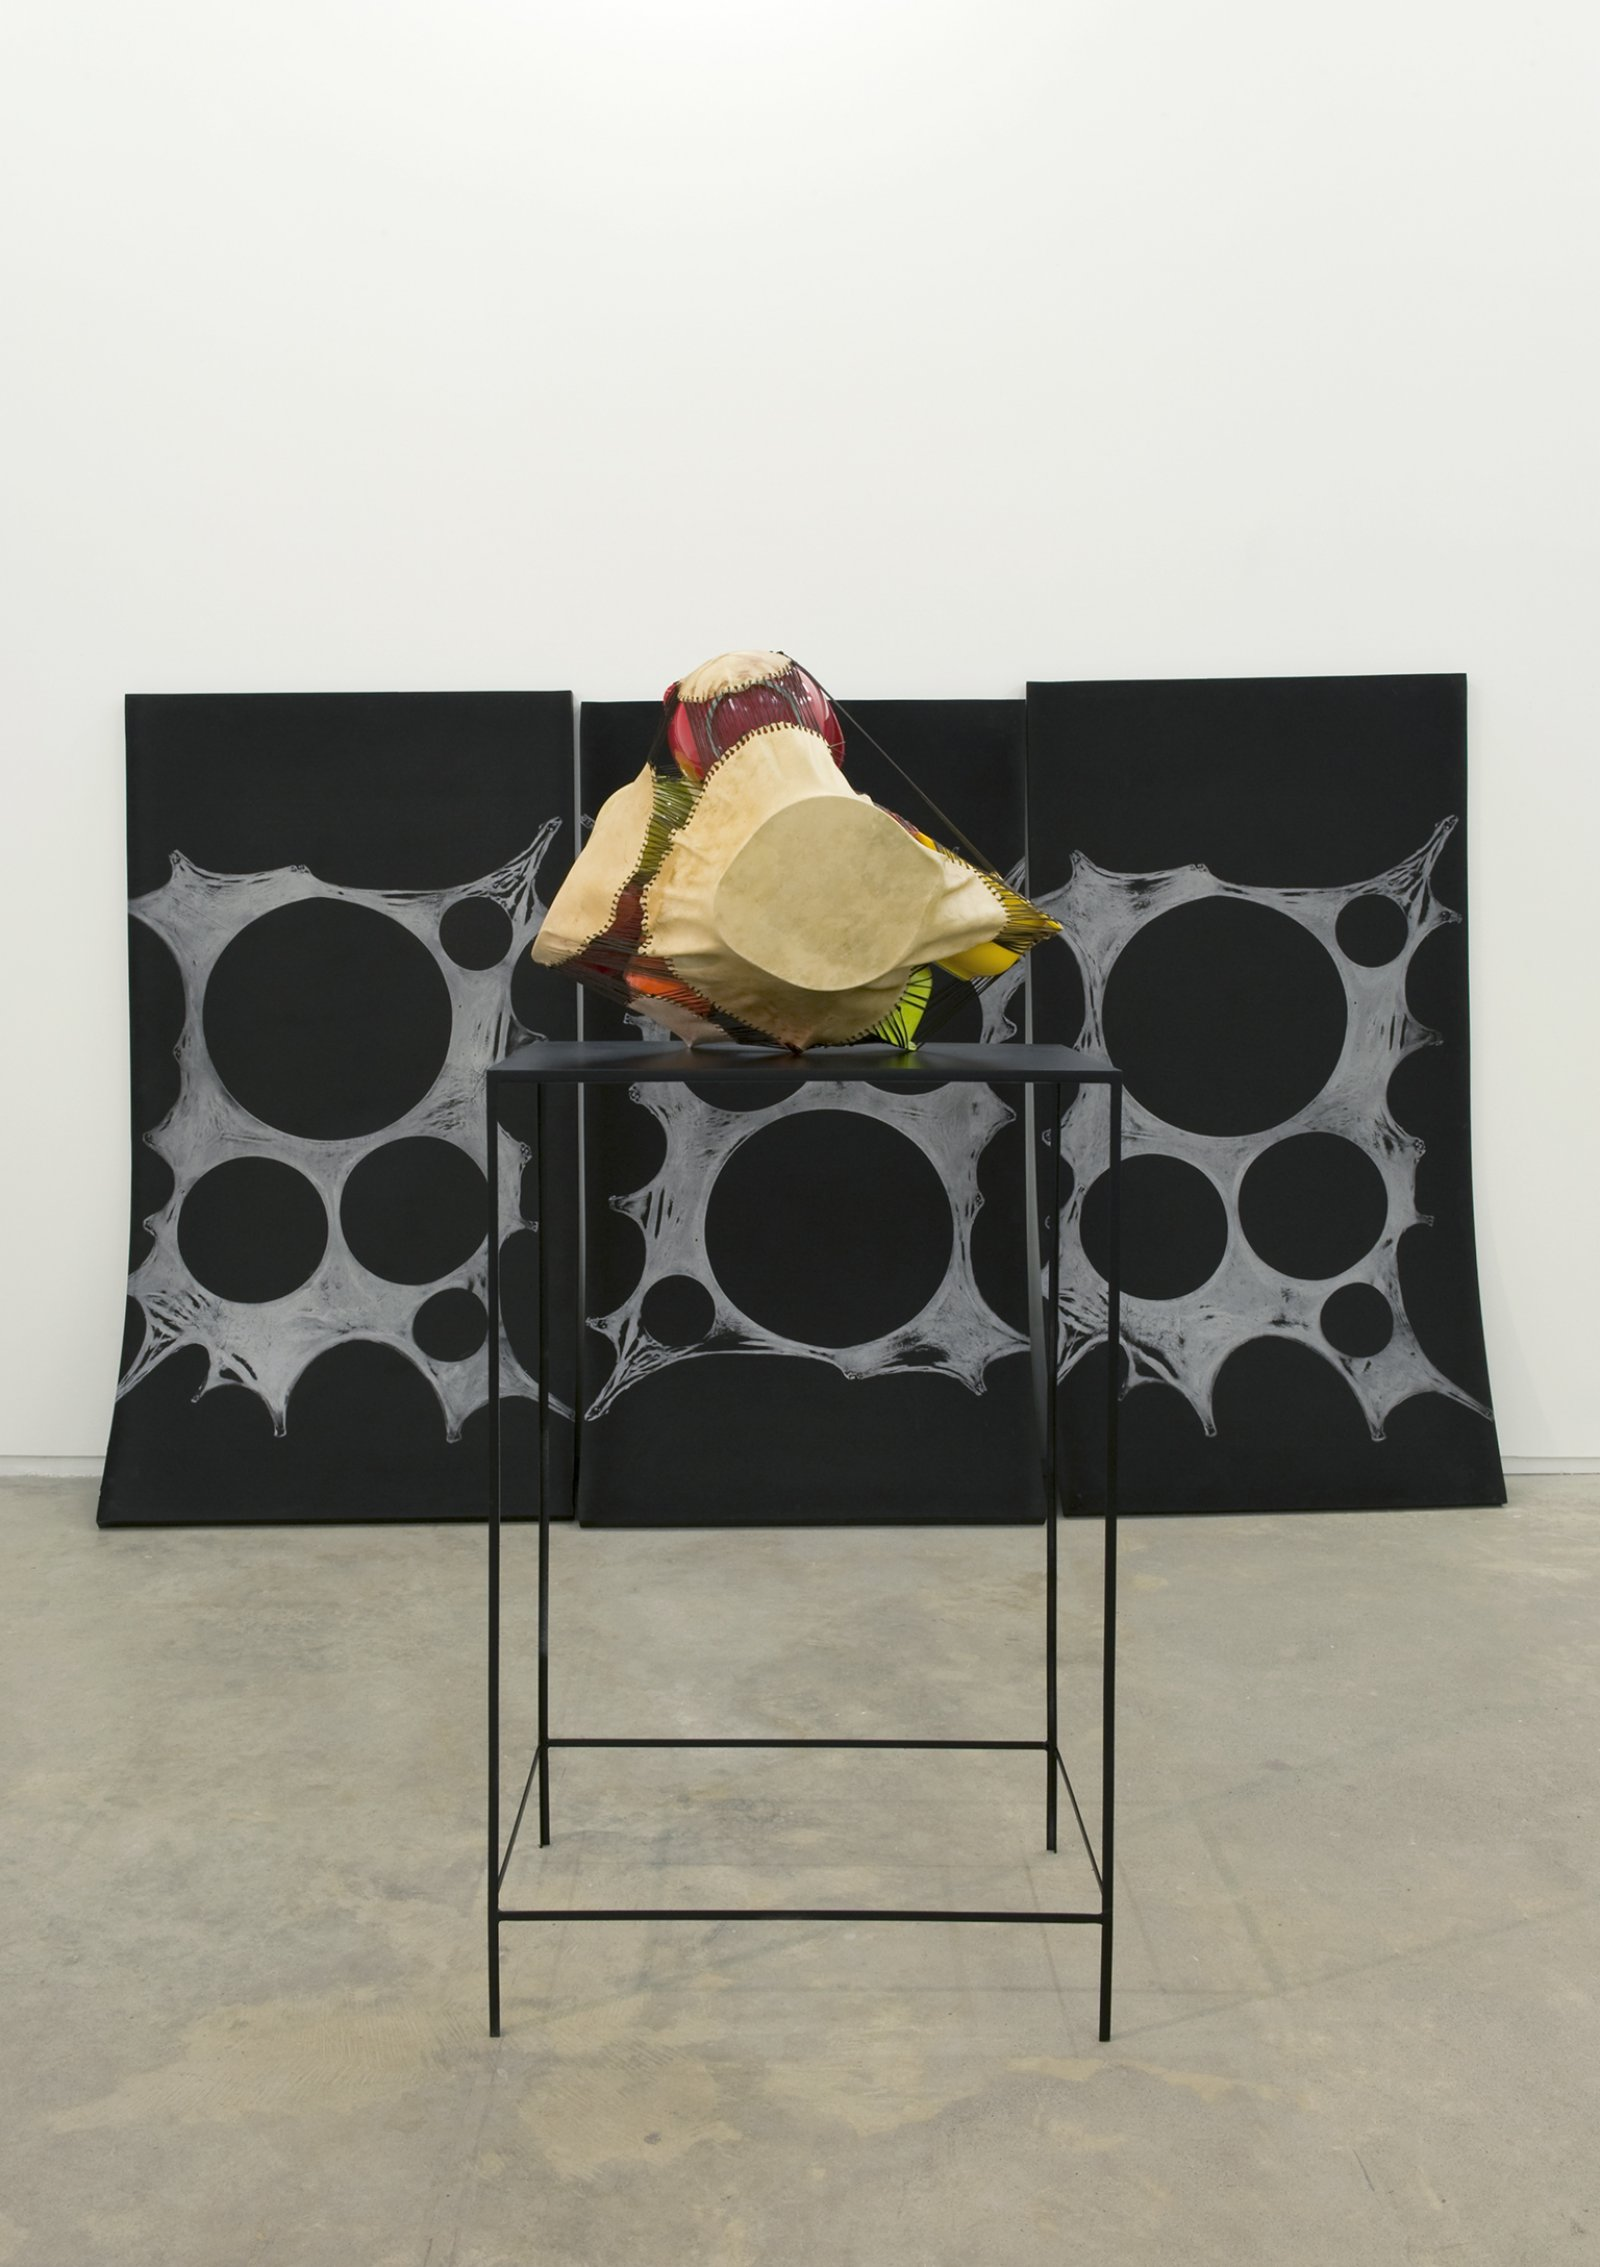 Brian Jungen,Subject, Silver, Prism, 2011,foam, silver relief ink, plastic bowls, deer hide, tarred twine, steel, 78 x 120 x 300 in. (198 x 305 x 762 cm)